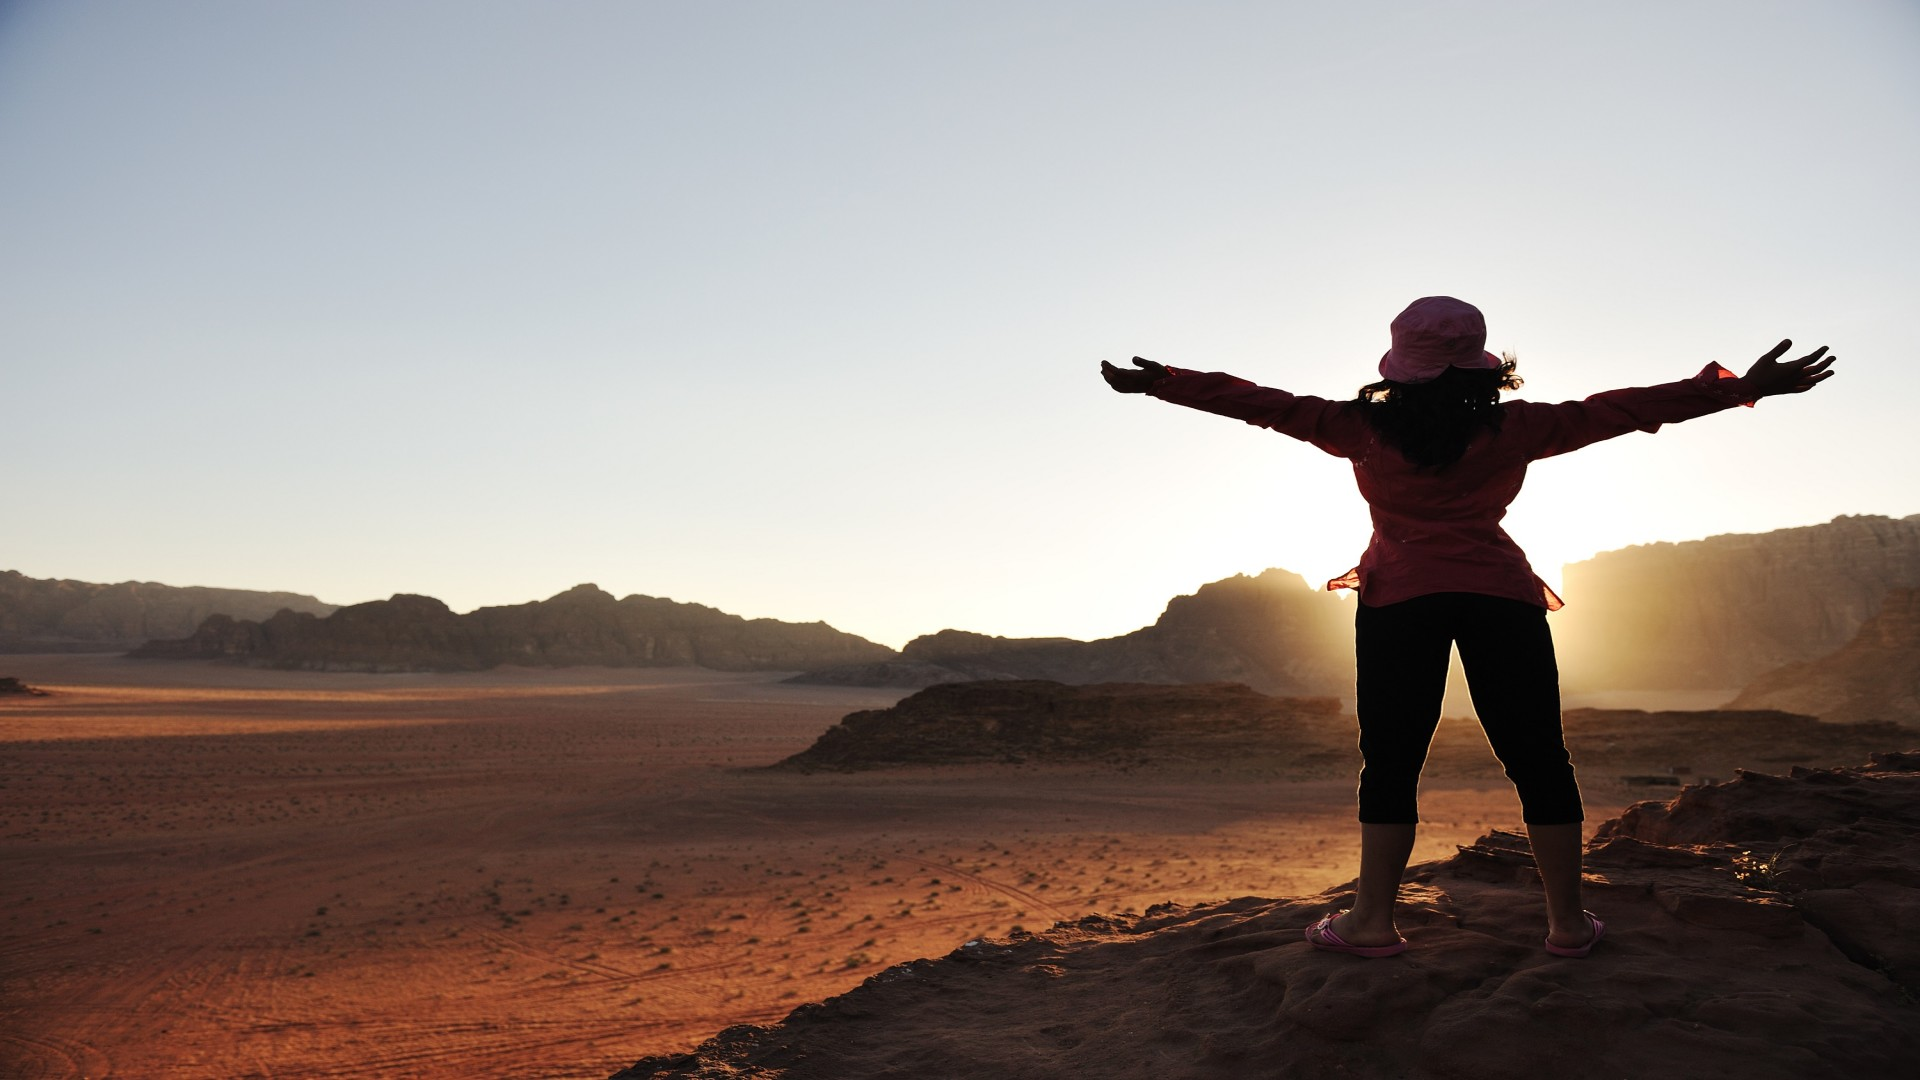 Priverondreis Jordanië - Wadi Rum woestijn